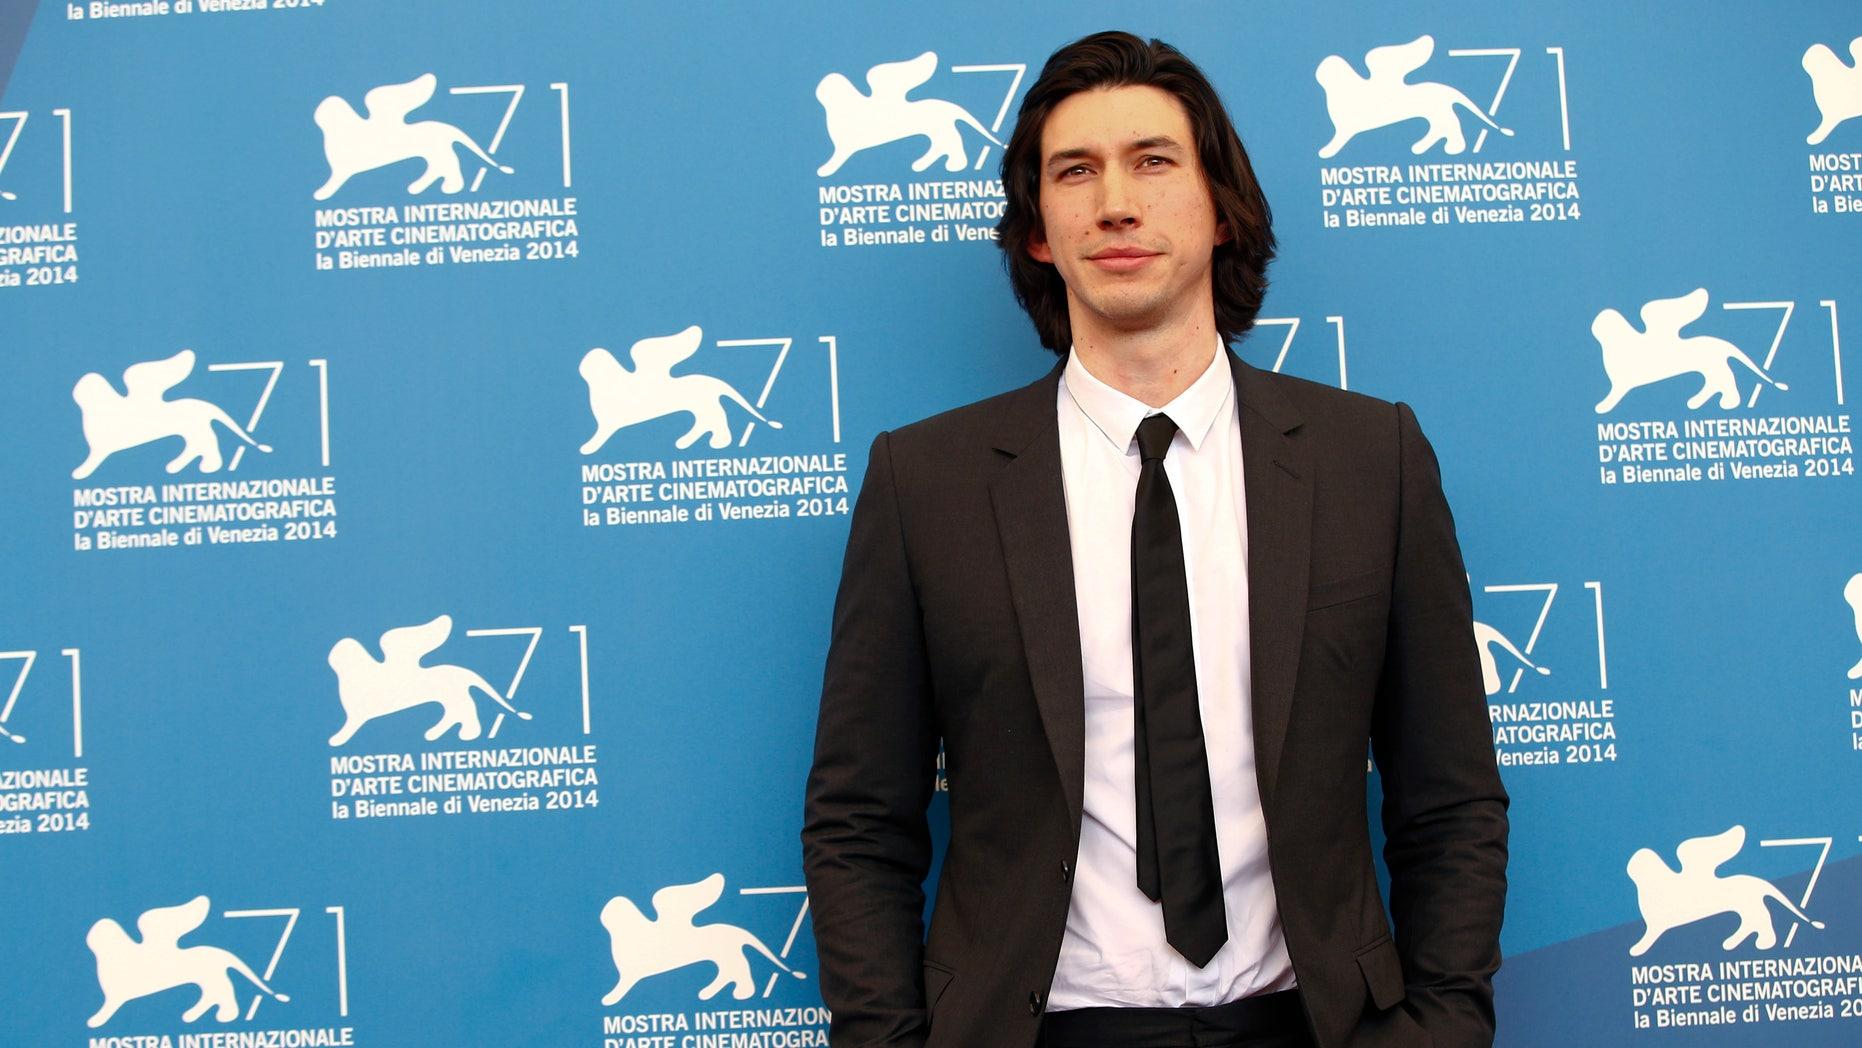 August 31, 2014. Adam Driver at the 71st Venice Film Festival.